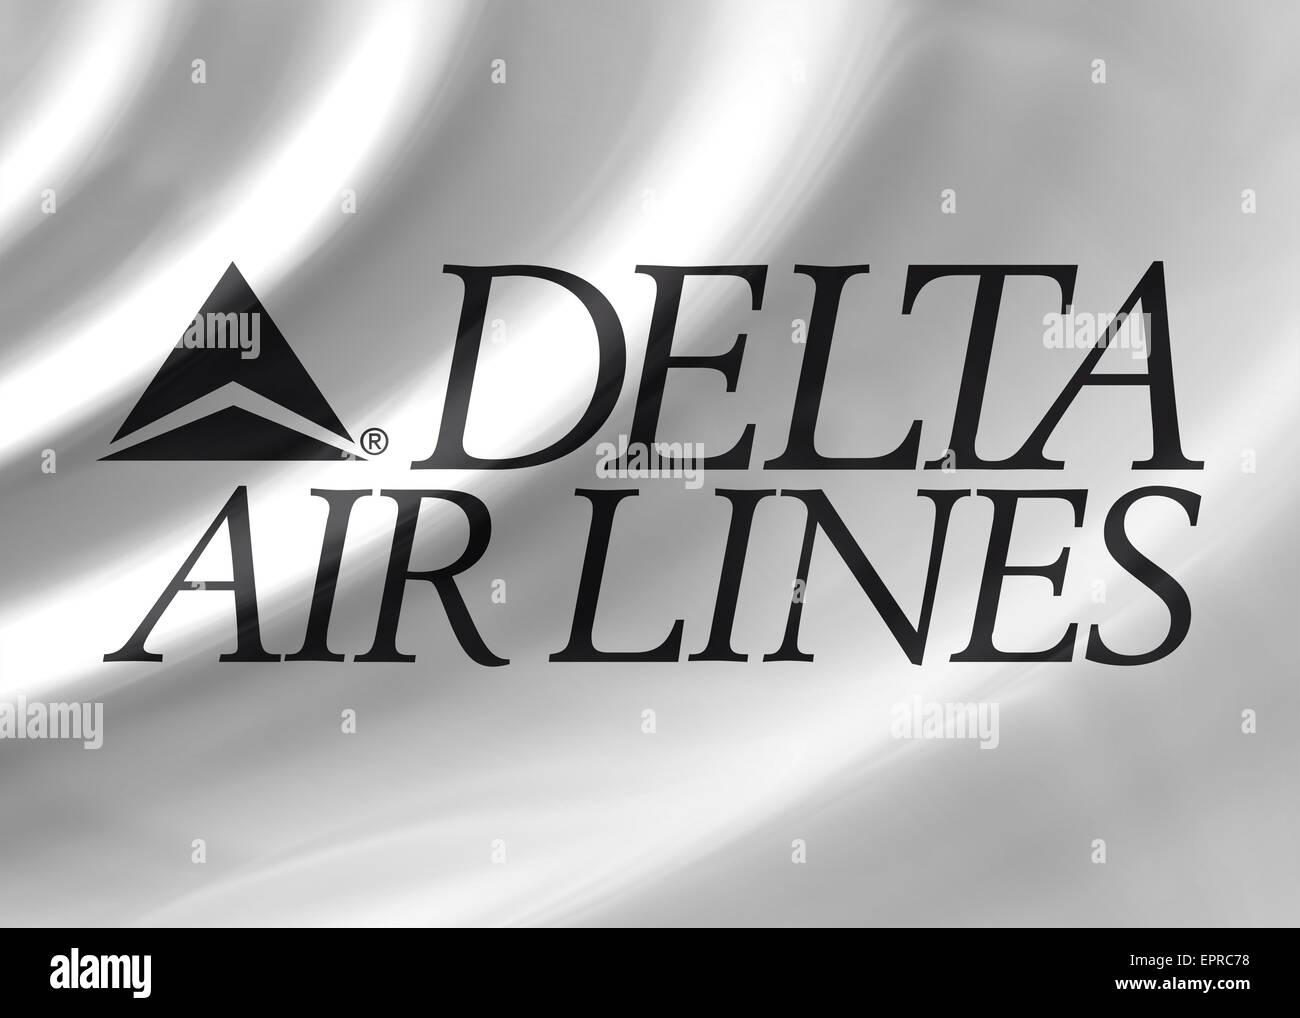 Delta airlines logo icon flag symbol emblem sign stock photo delta airlines logo icon flag symbol emblem sign biocorpaavc Choice Image